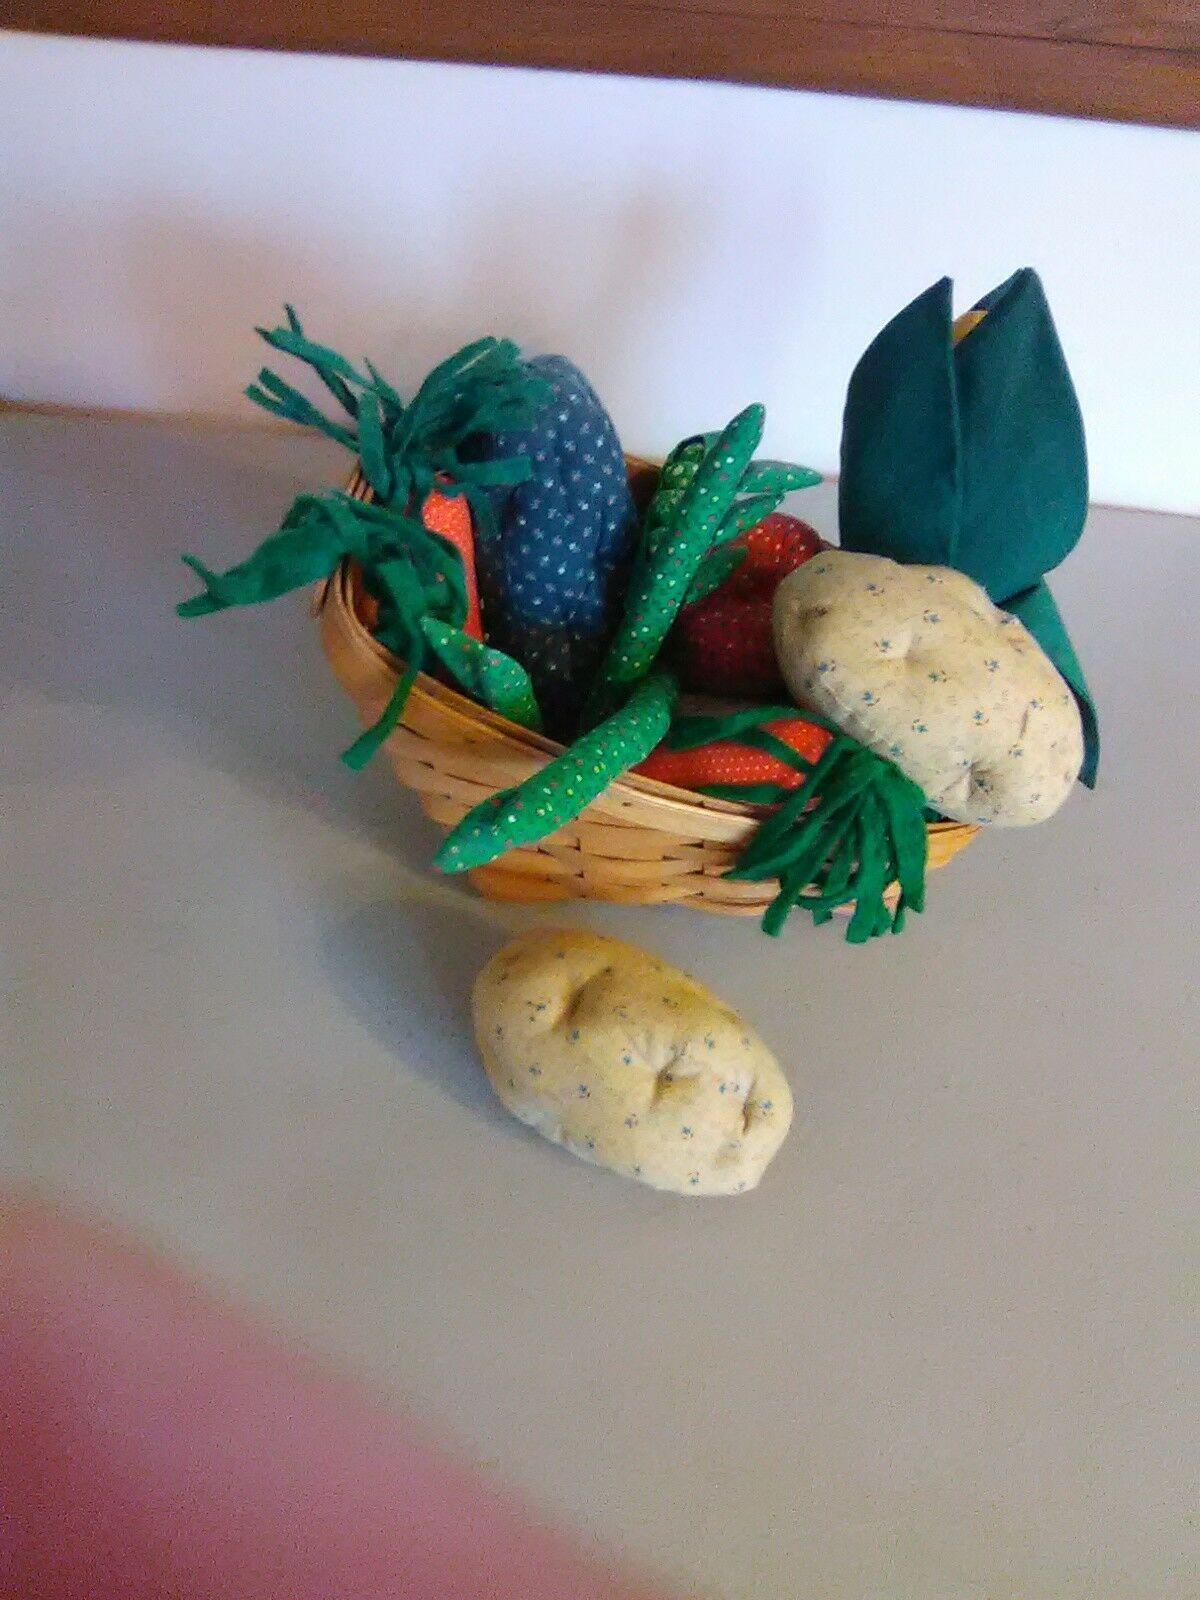 Longaberger Vegetable Sleigh Basket 1995  - Hand sewn vegetables